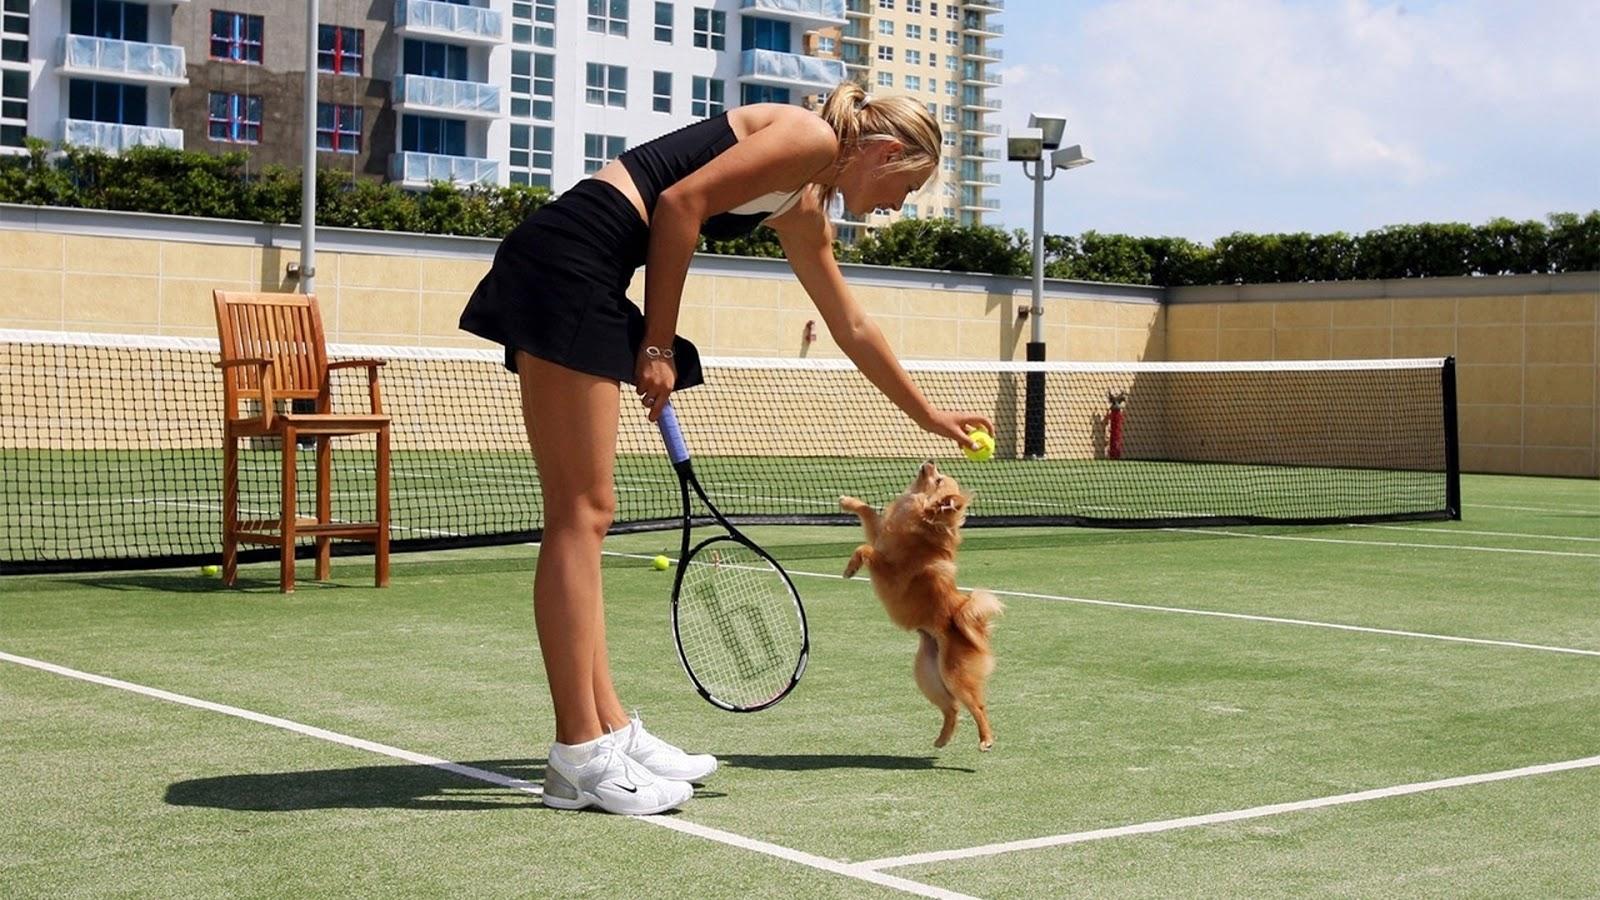 Tennis - Eugenie Bouchard ´I loved Anna Kournikova and